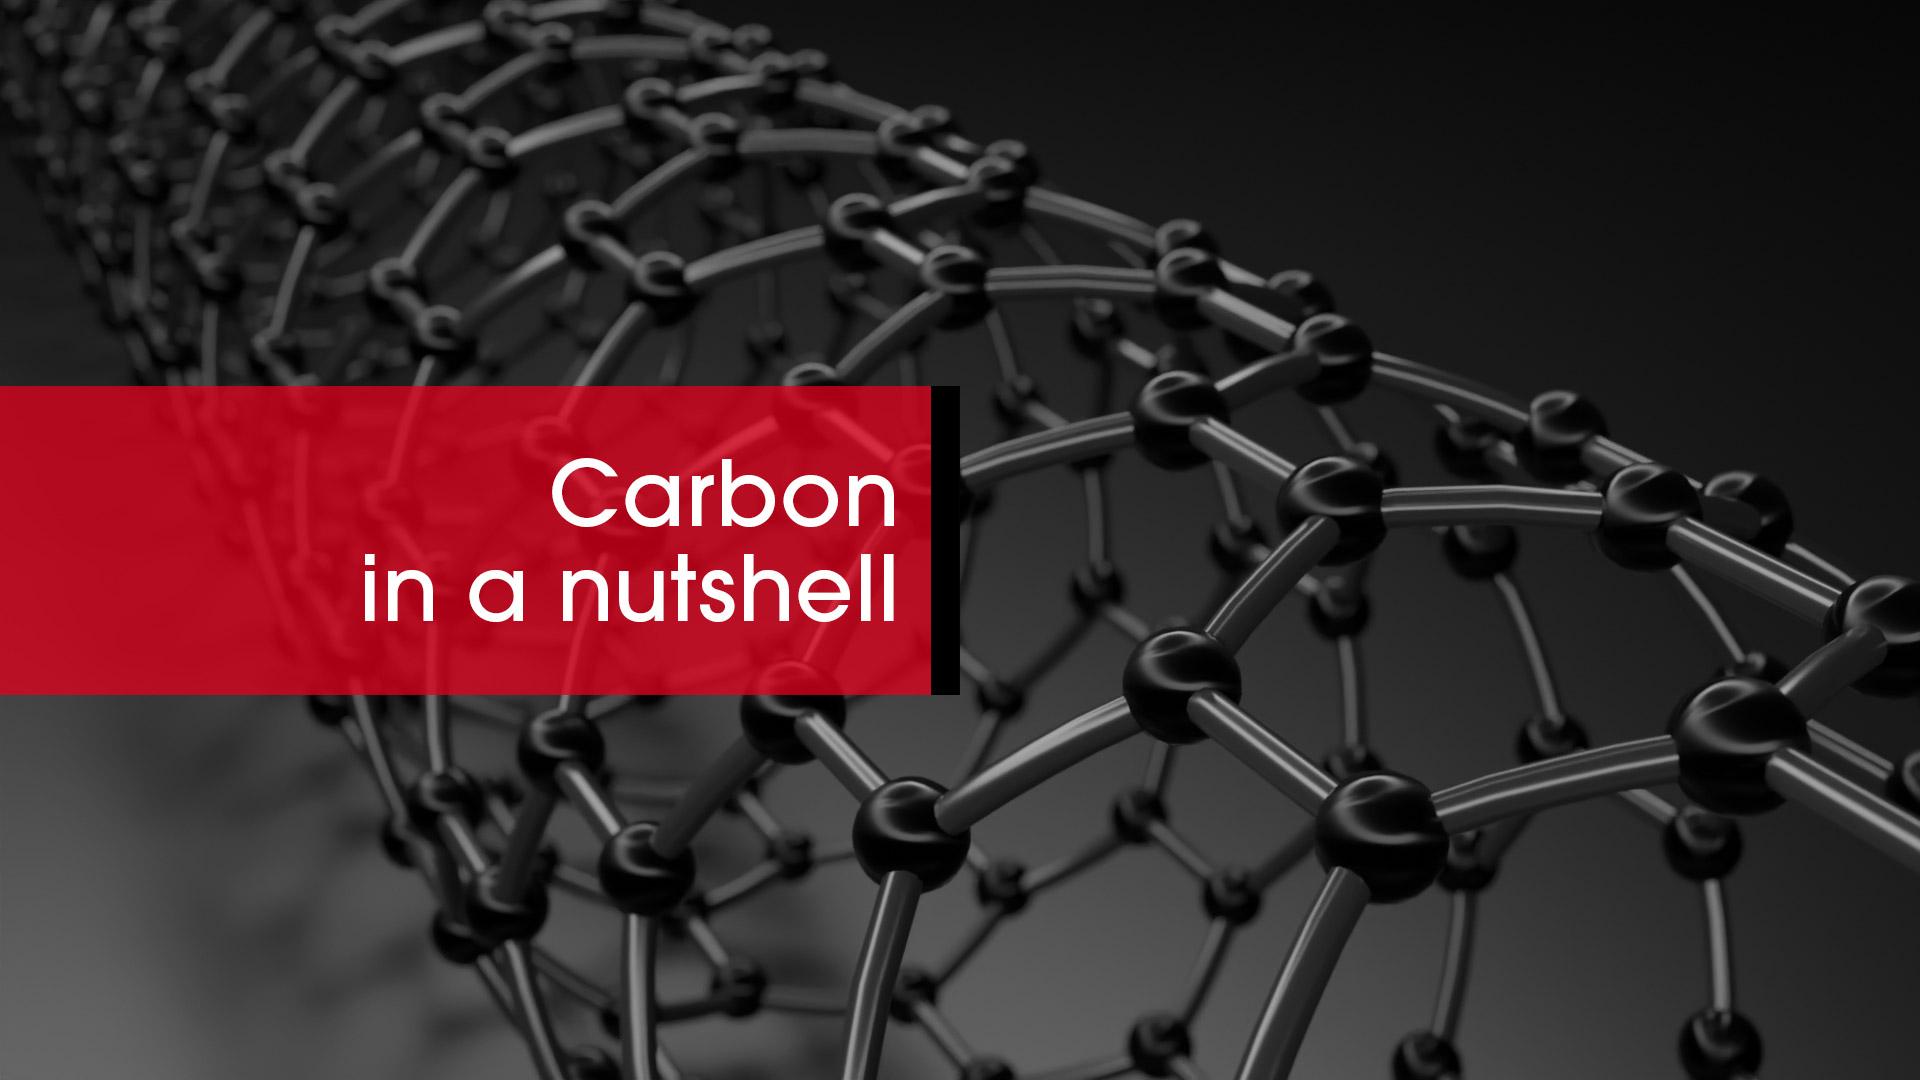 Educational videos on carbon and its properties: lightness, stiffness, aesthetics, design